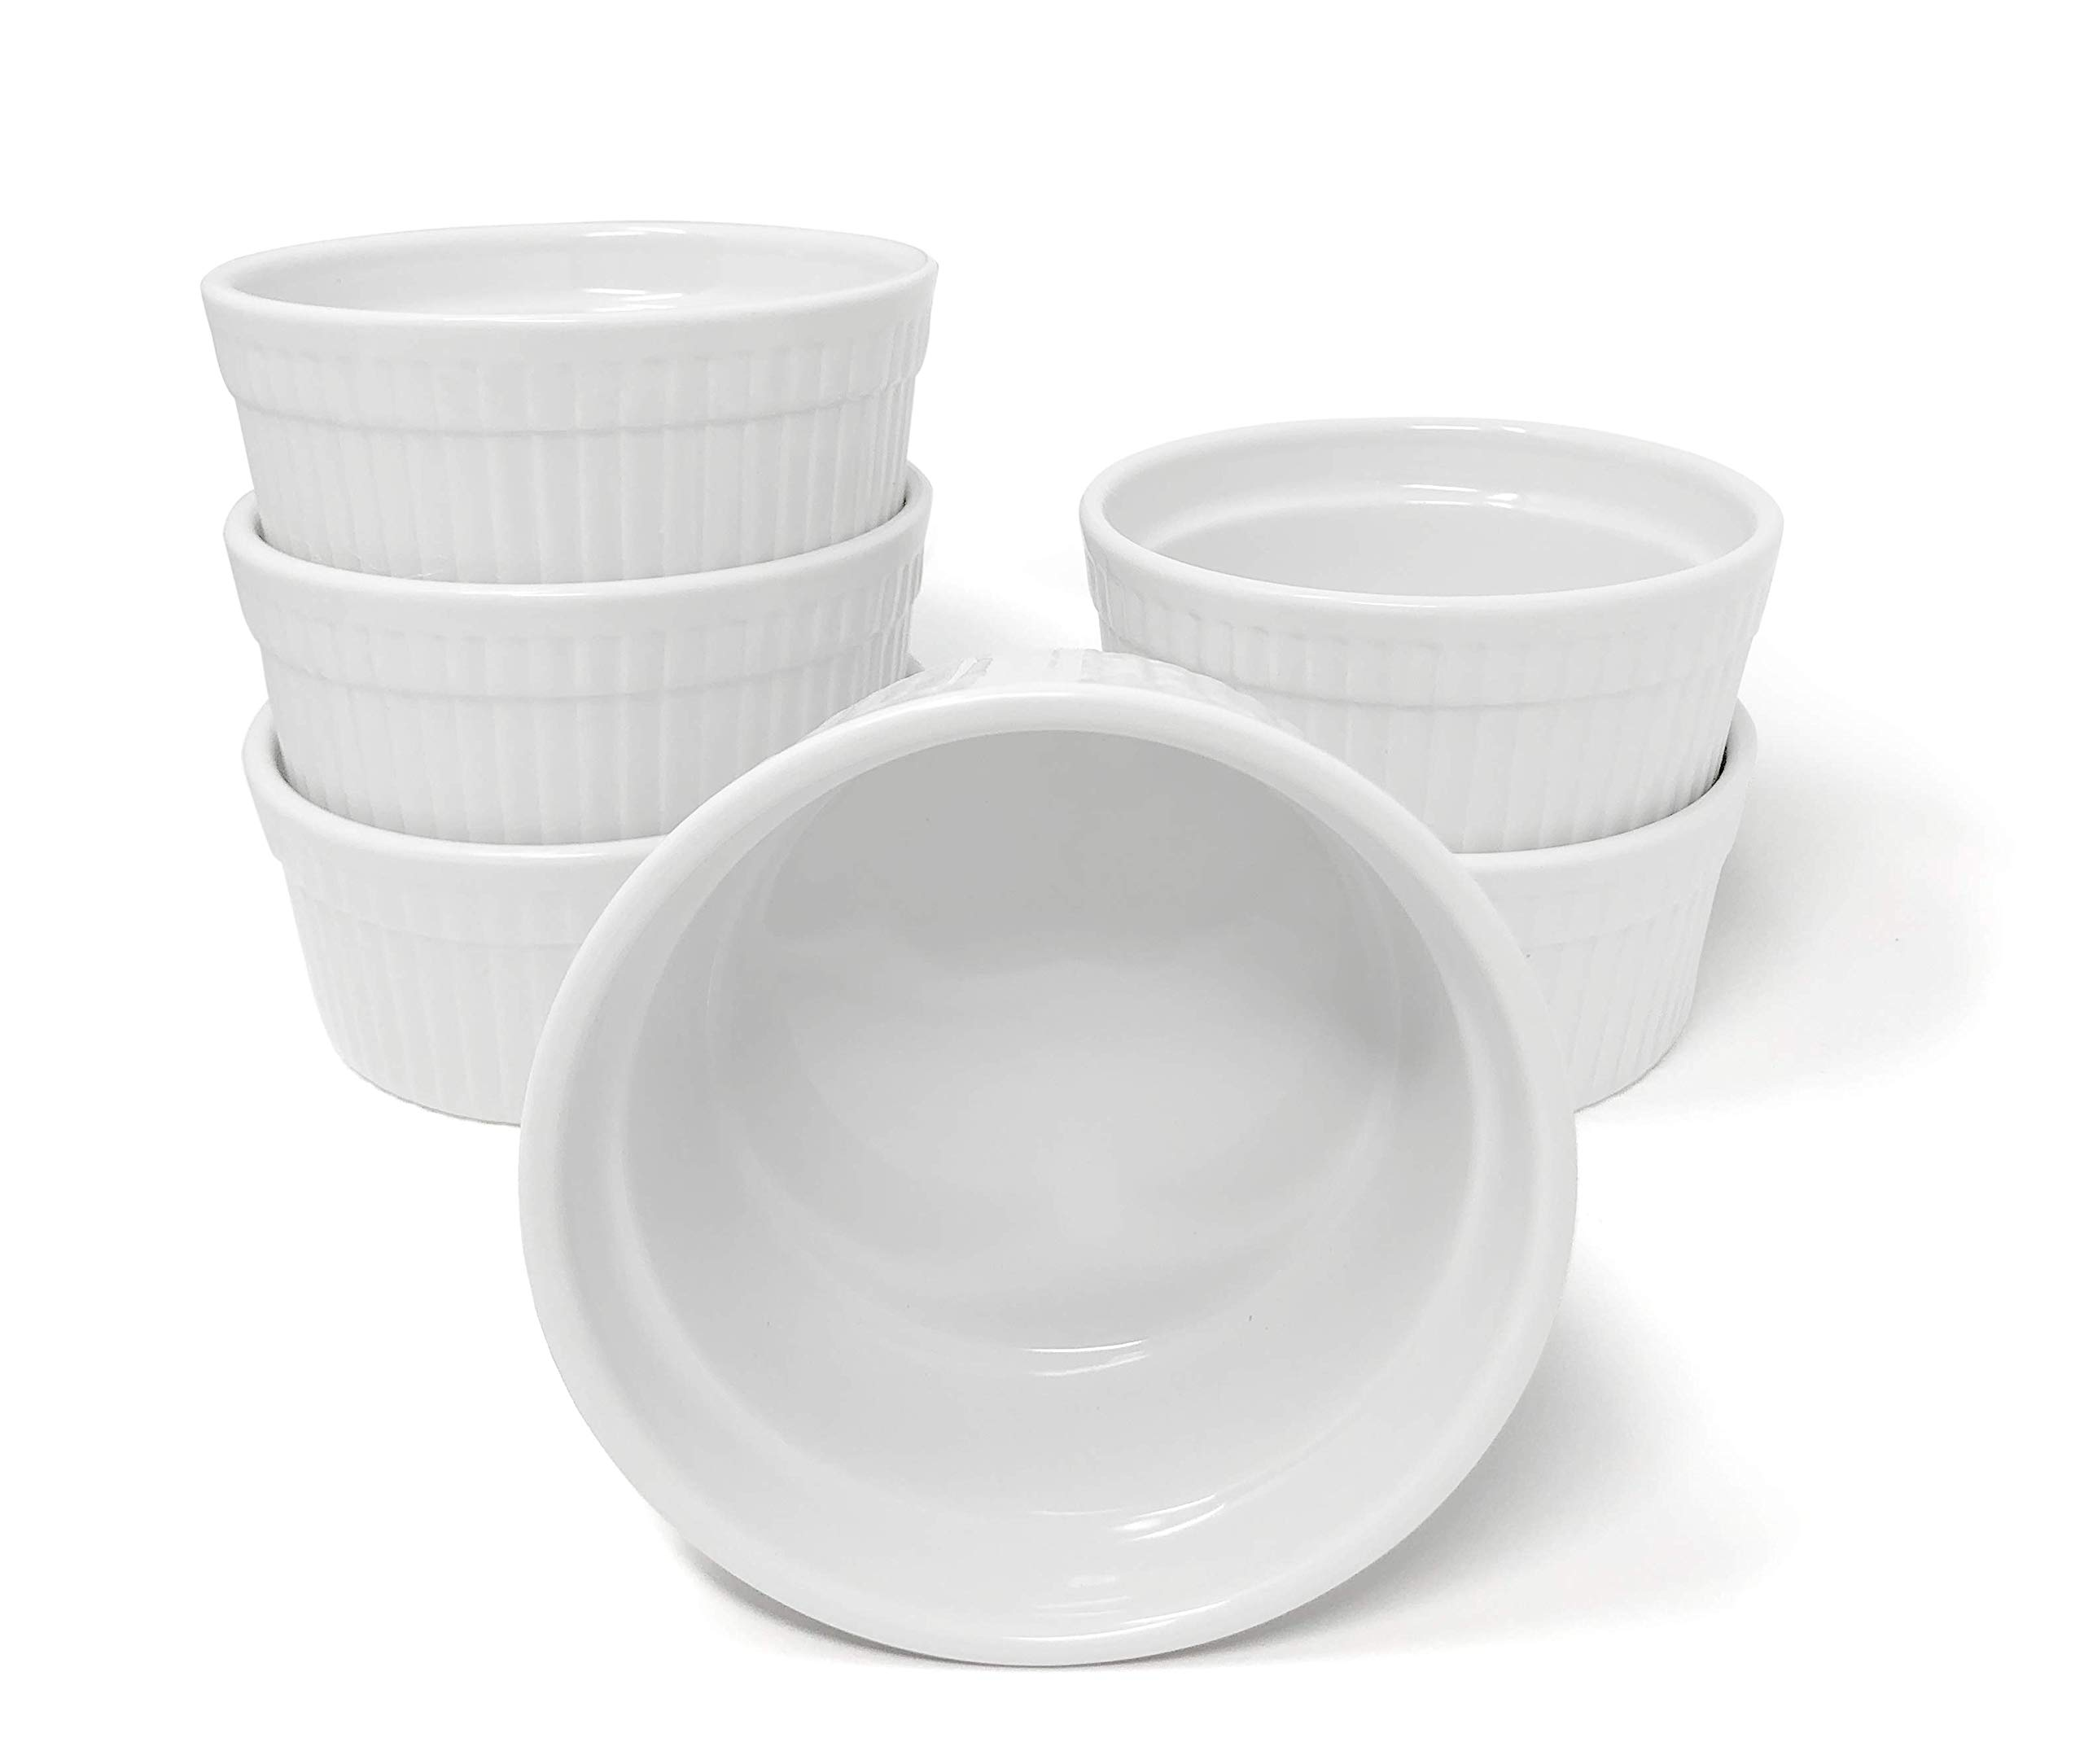 White Porcelain 6-Piece Ramekin Set, 18oz. Dishwasher, Microwave and Oven Safe! by Furmaware